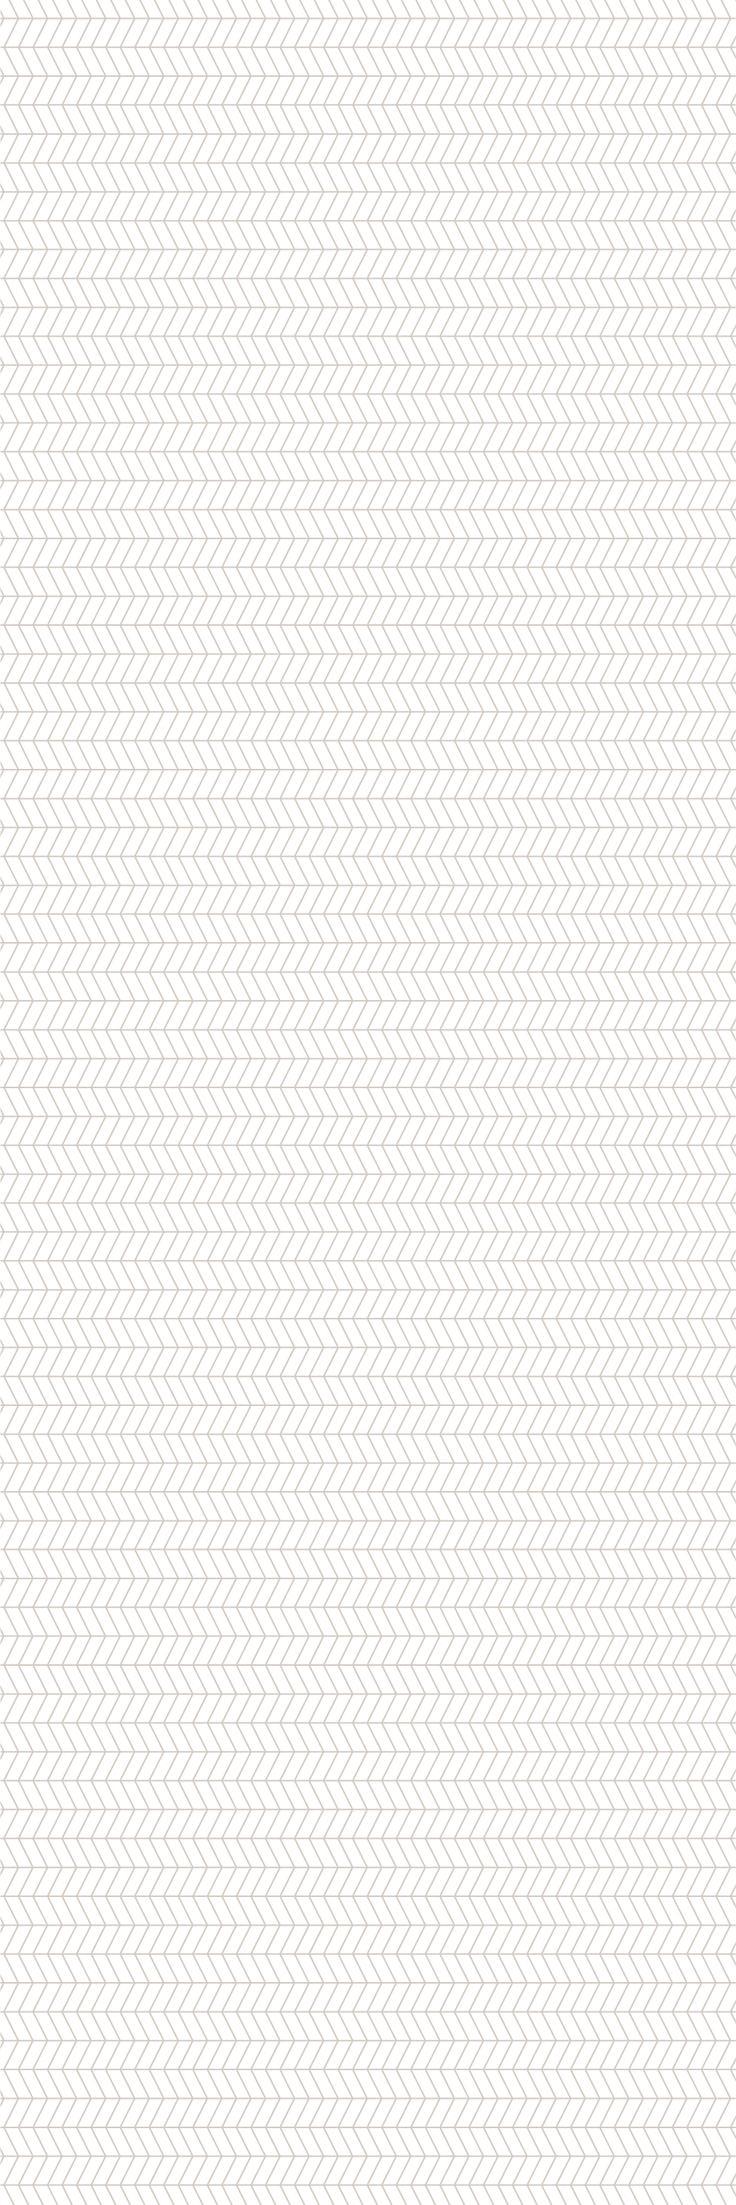 Custom printed Herringbone wallpaper from the 'REFRESH' colour range #herringbone #wallpaper #muurgraphics